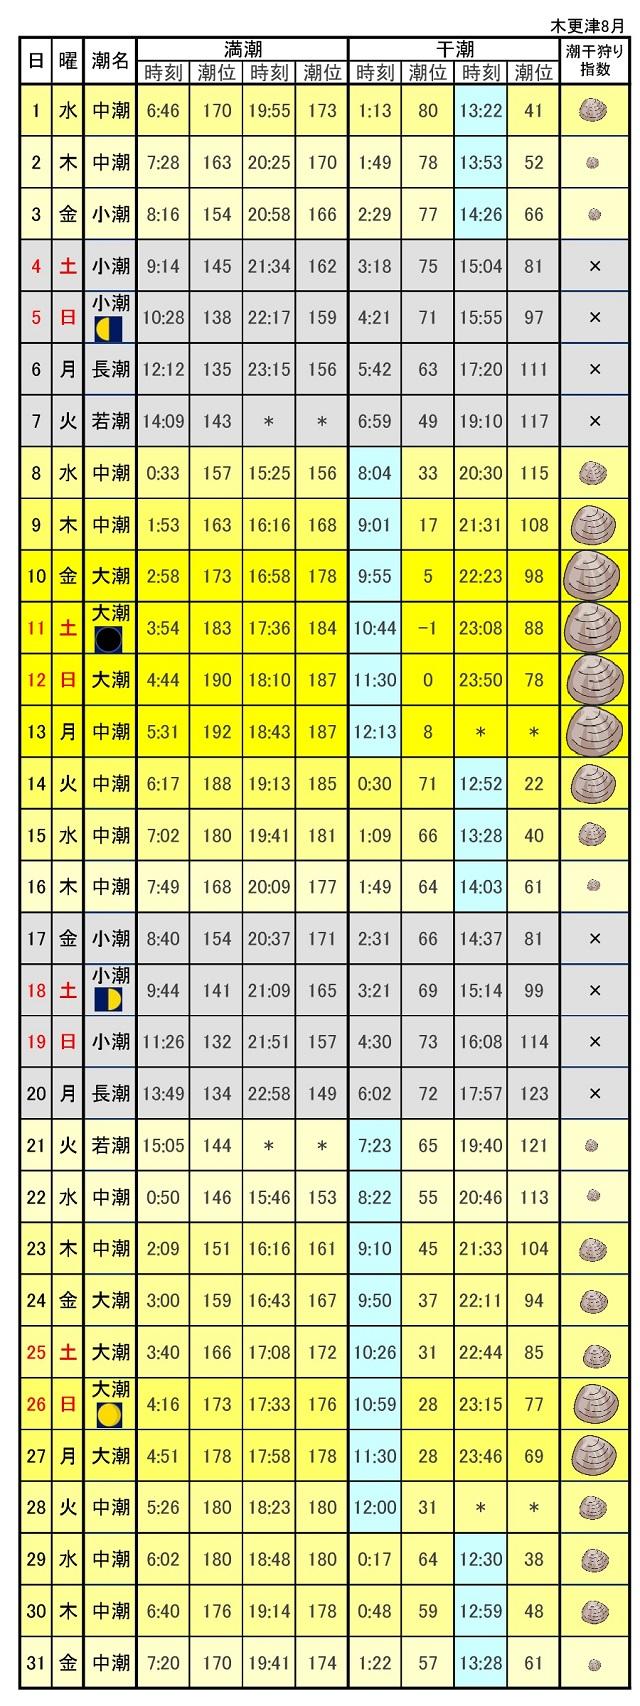 木更津潮干狩り潮位表2018年8月